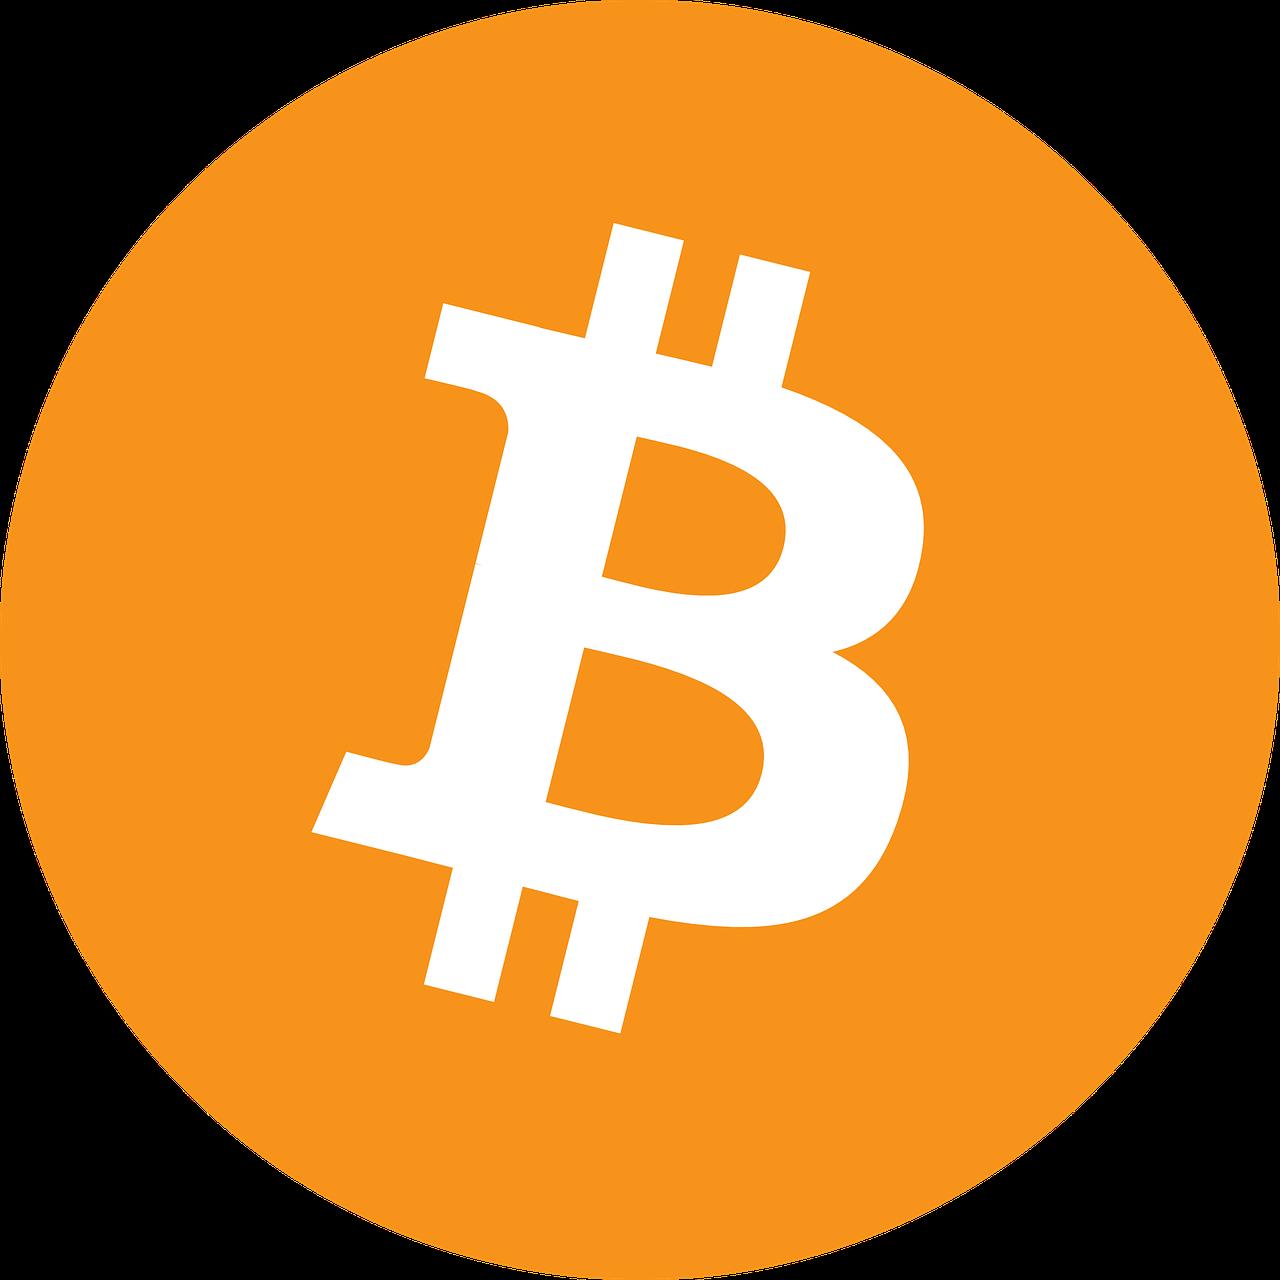 bitcoin-910307_1280.png